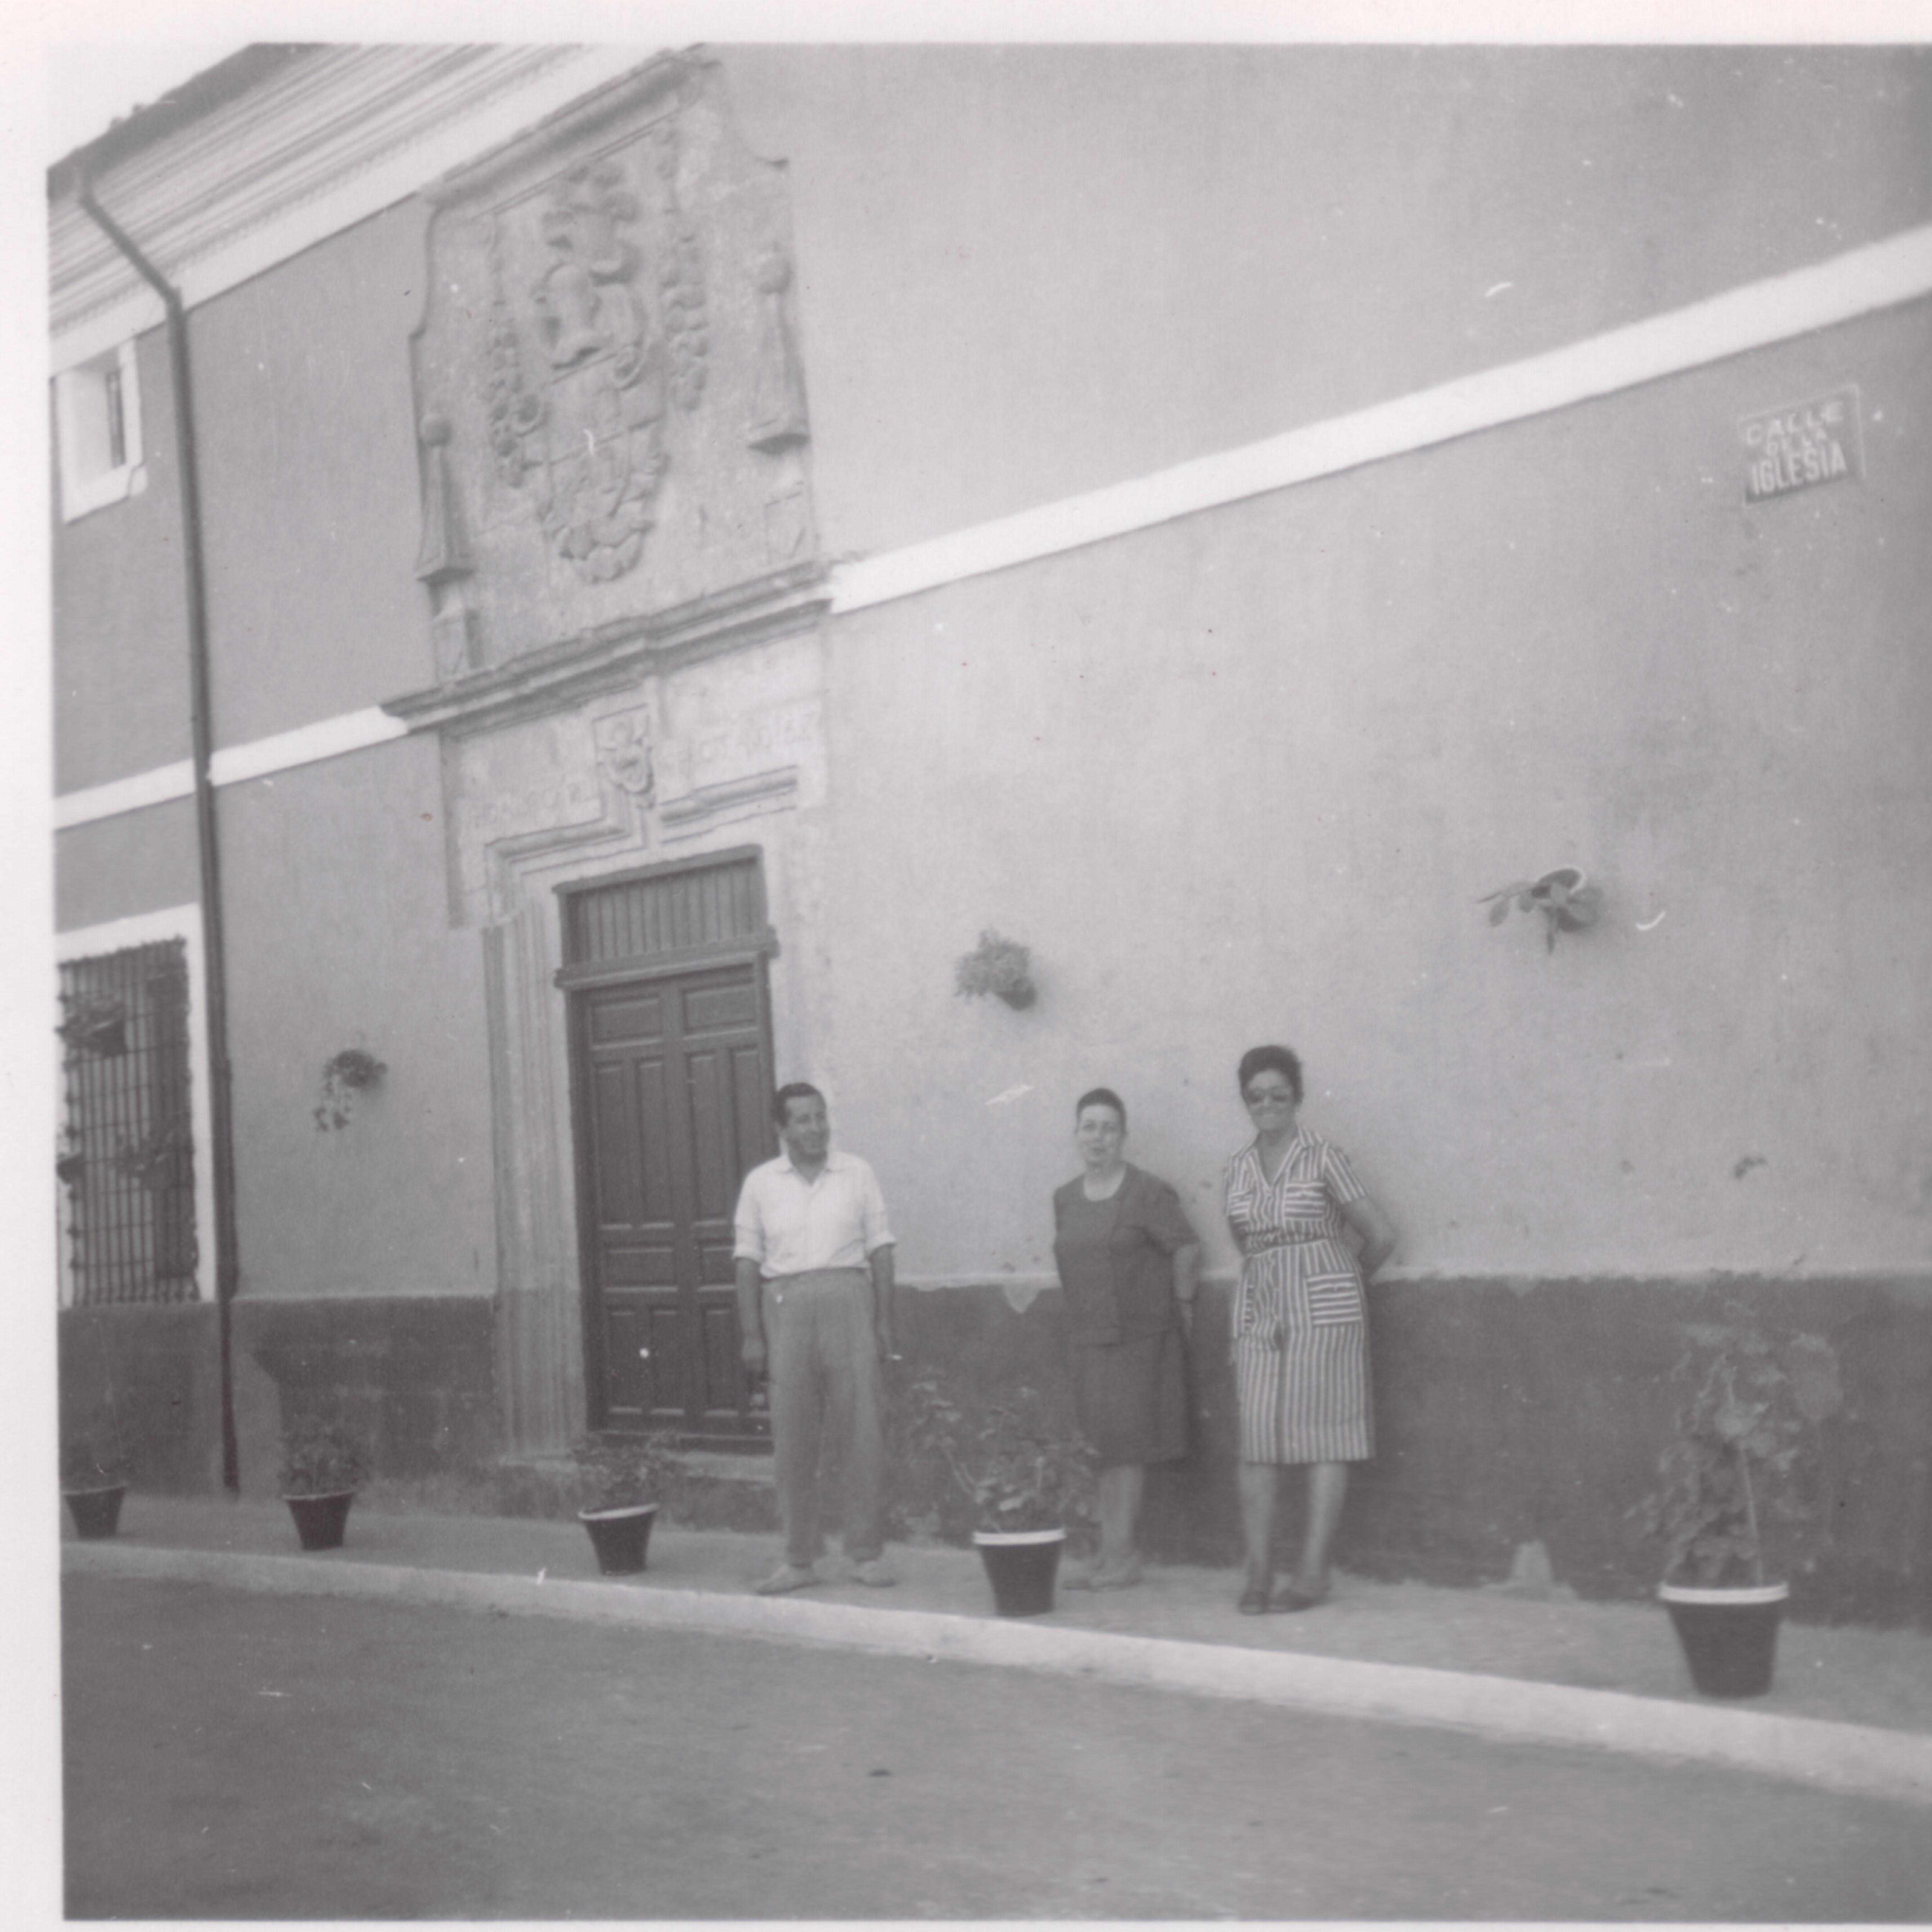 Hidalgo Carrillo